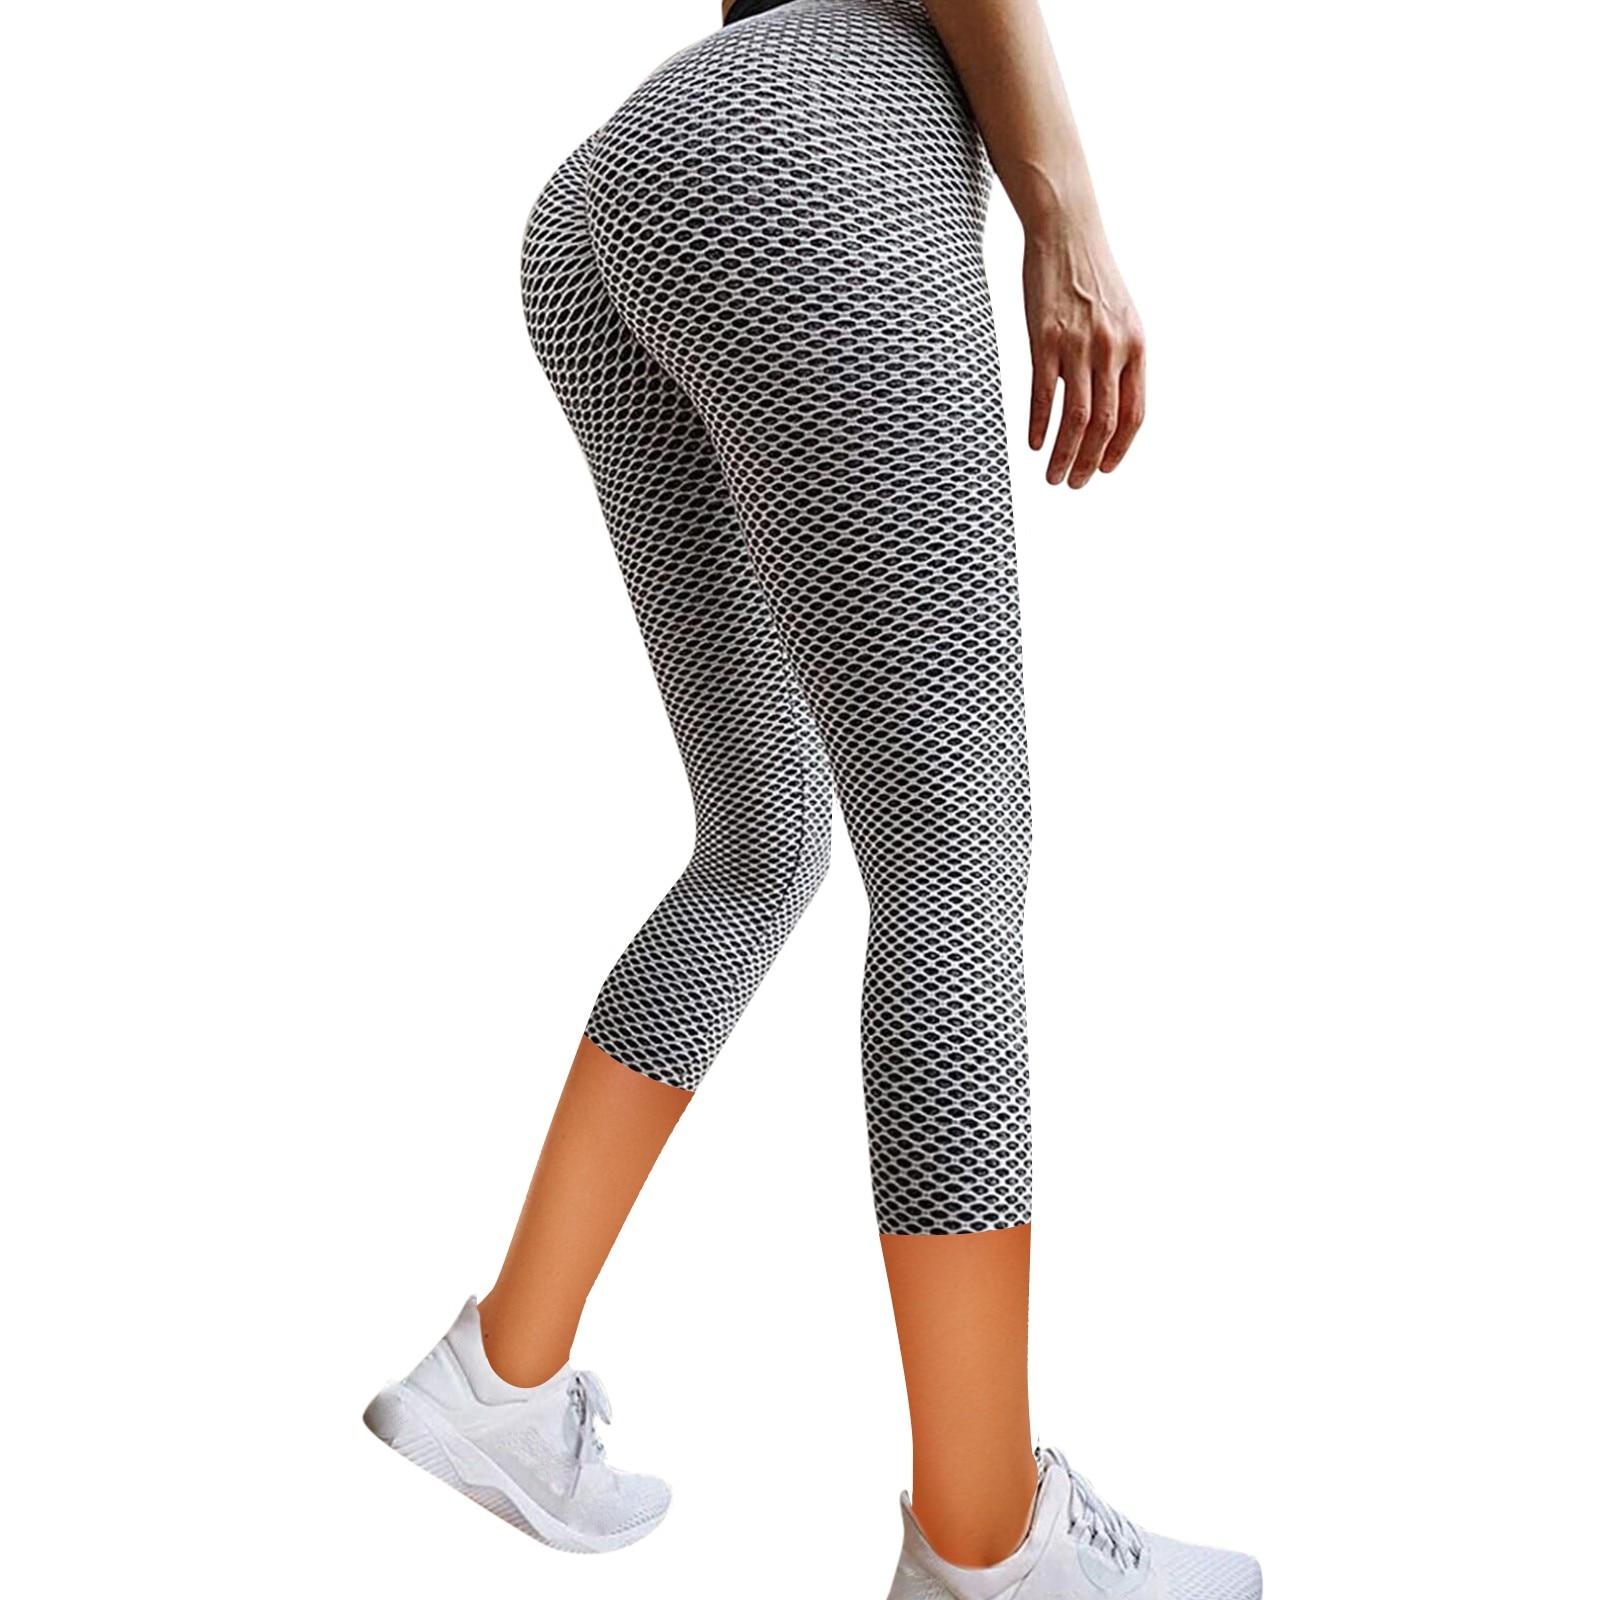 Women's Stretch Yo ga Leggings Fitness Running Gym Sports Pockets Active Pants pantalones de mujer gym clothing sport pant